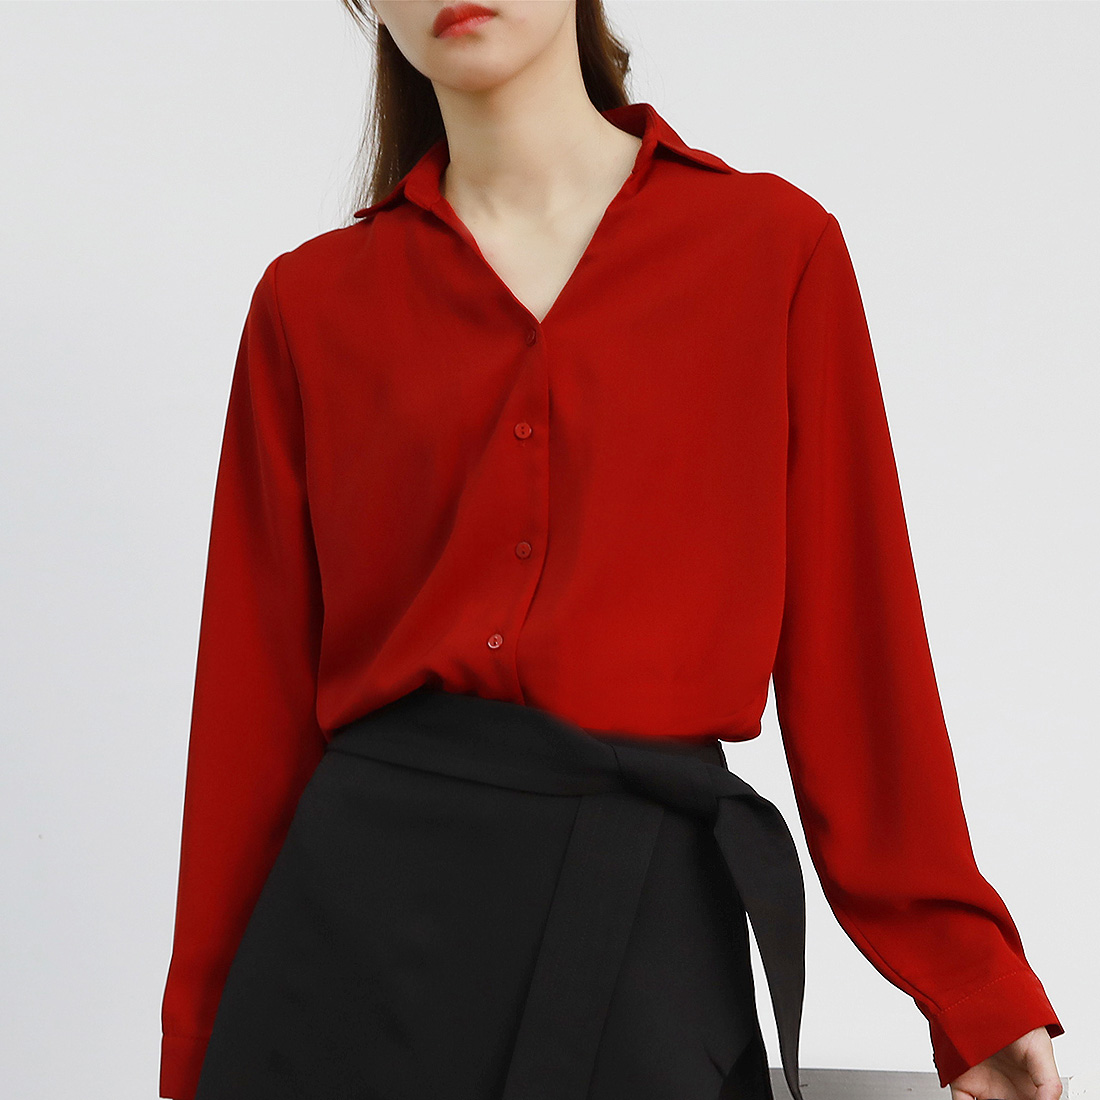 JO-JO-Z 独家V领长袖缎绒衬衫OL气质显瘦宽松上衣 正点复古石榴红